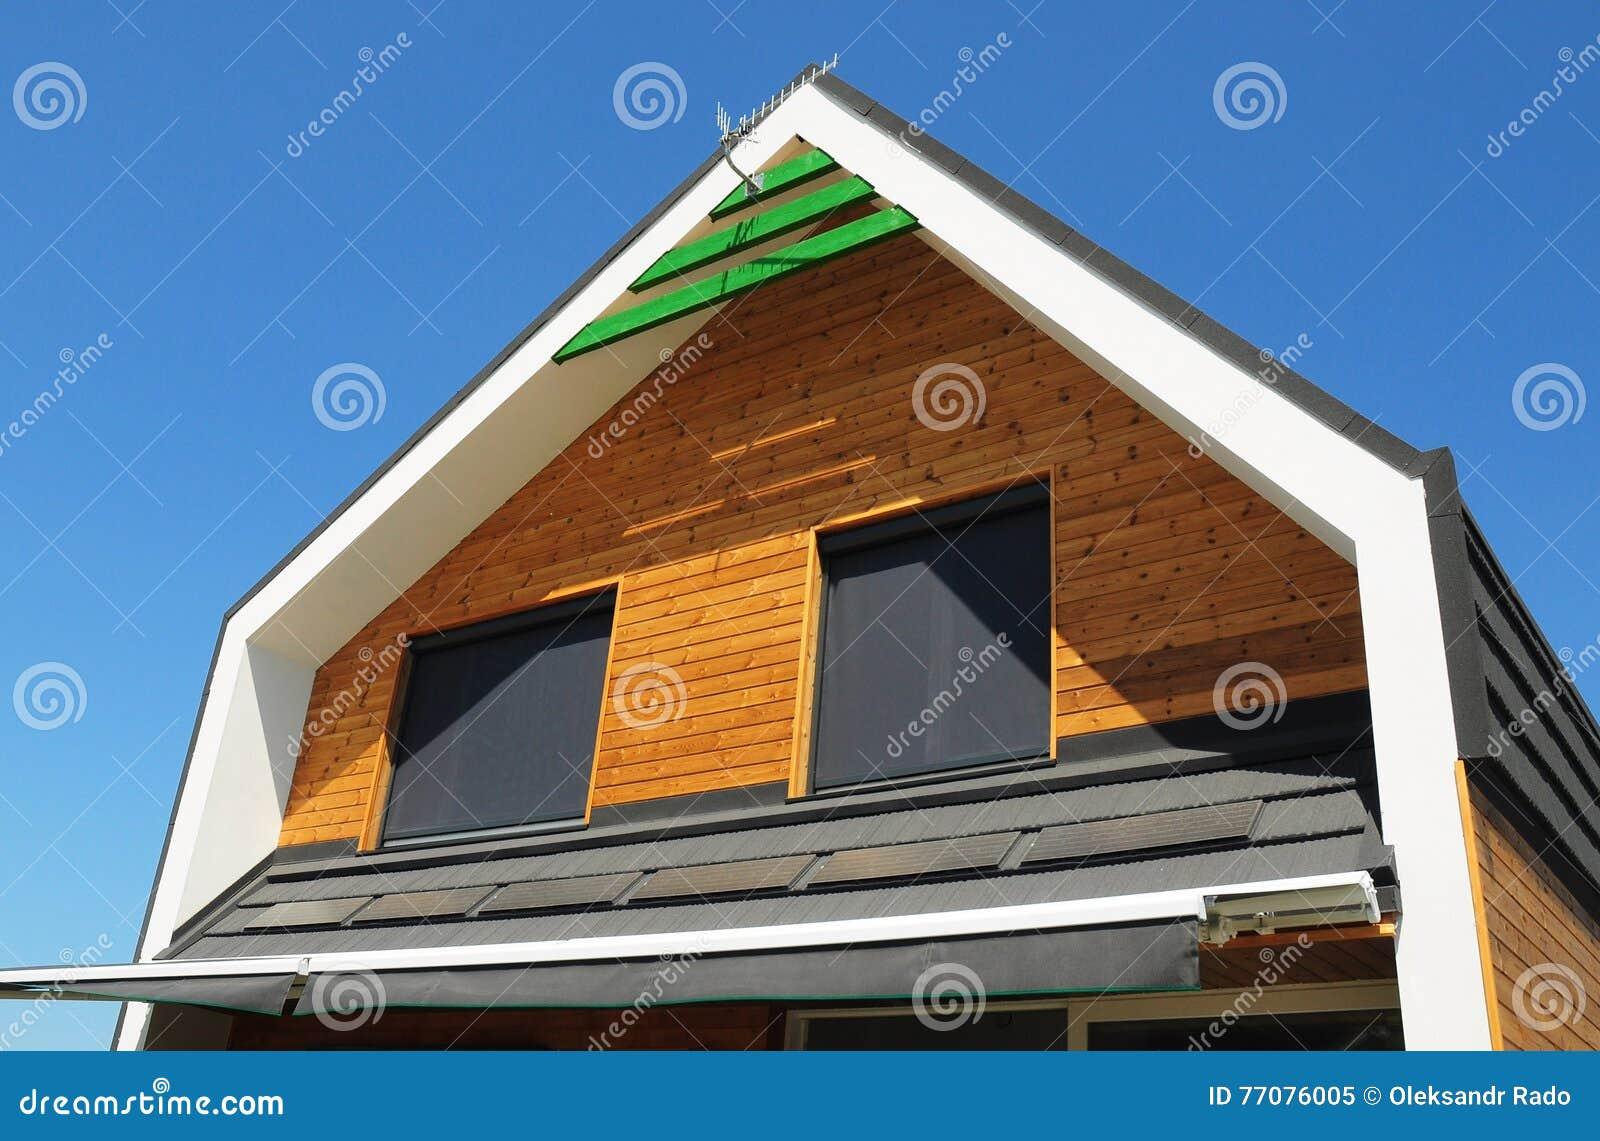 Windows protege a proteção contra Sun e calor Use máscaras de Windows, cortinas, cortinas para o uso eficaz da energia da casa